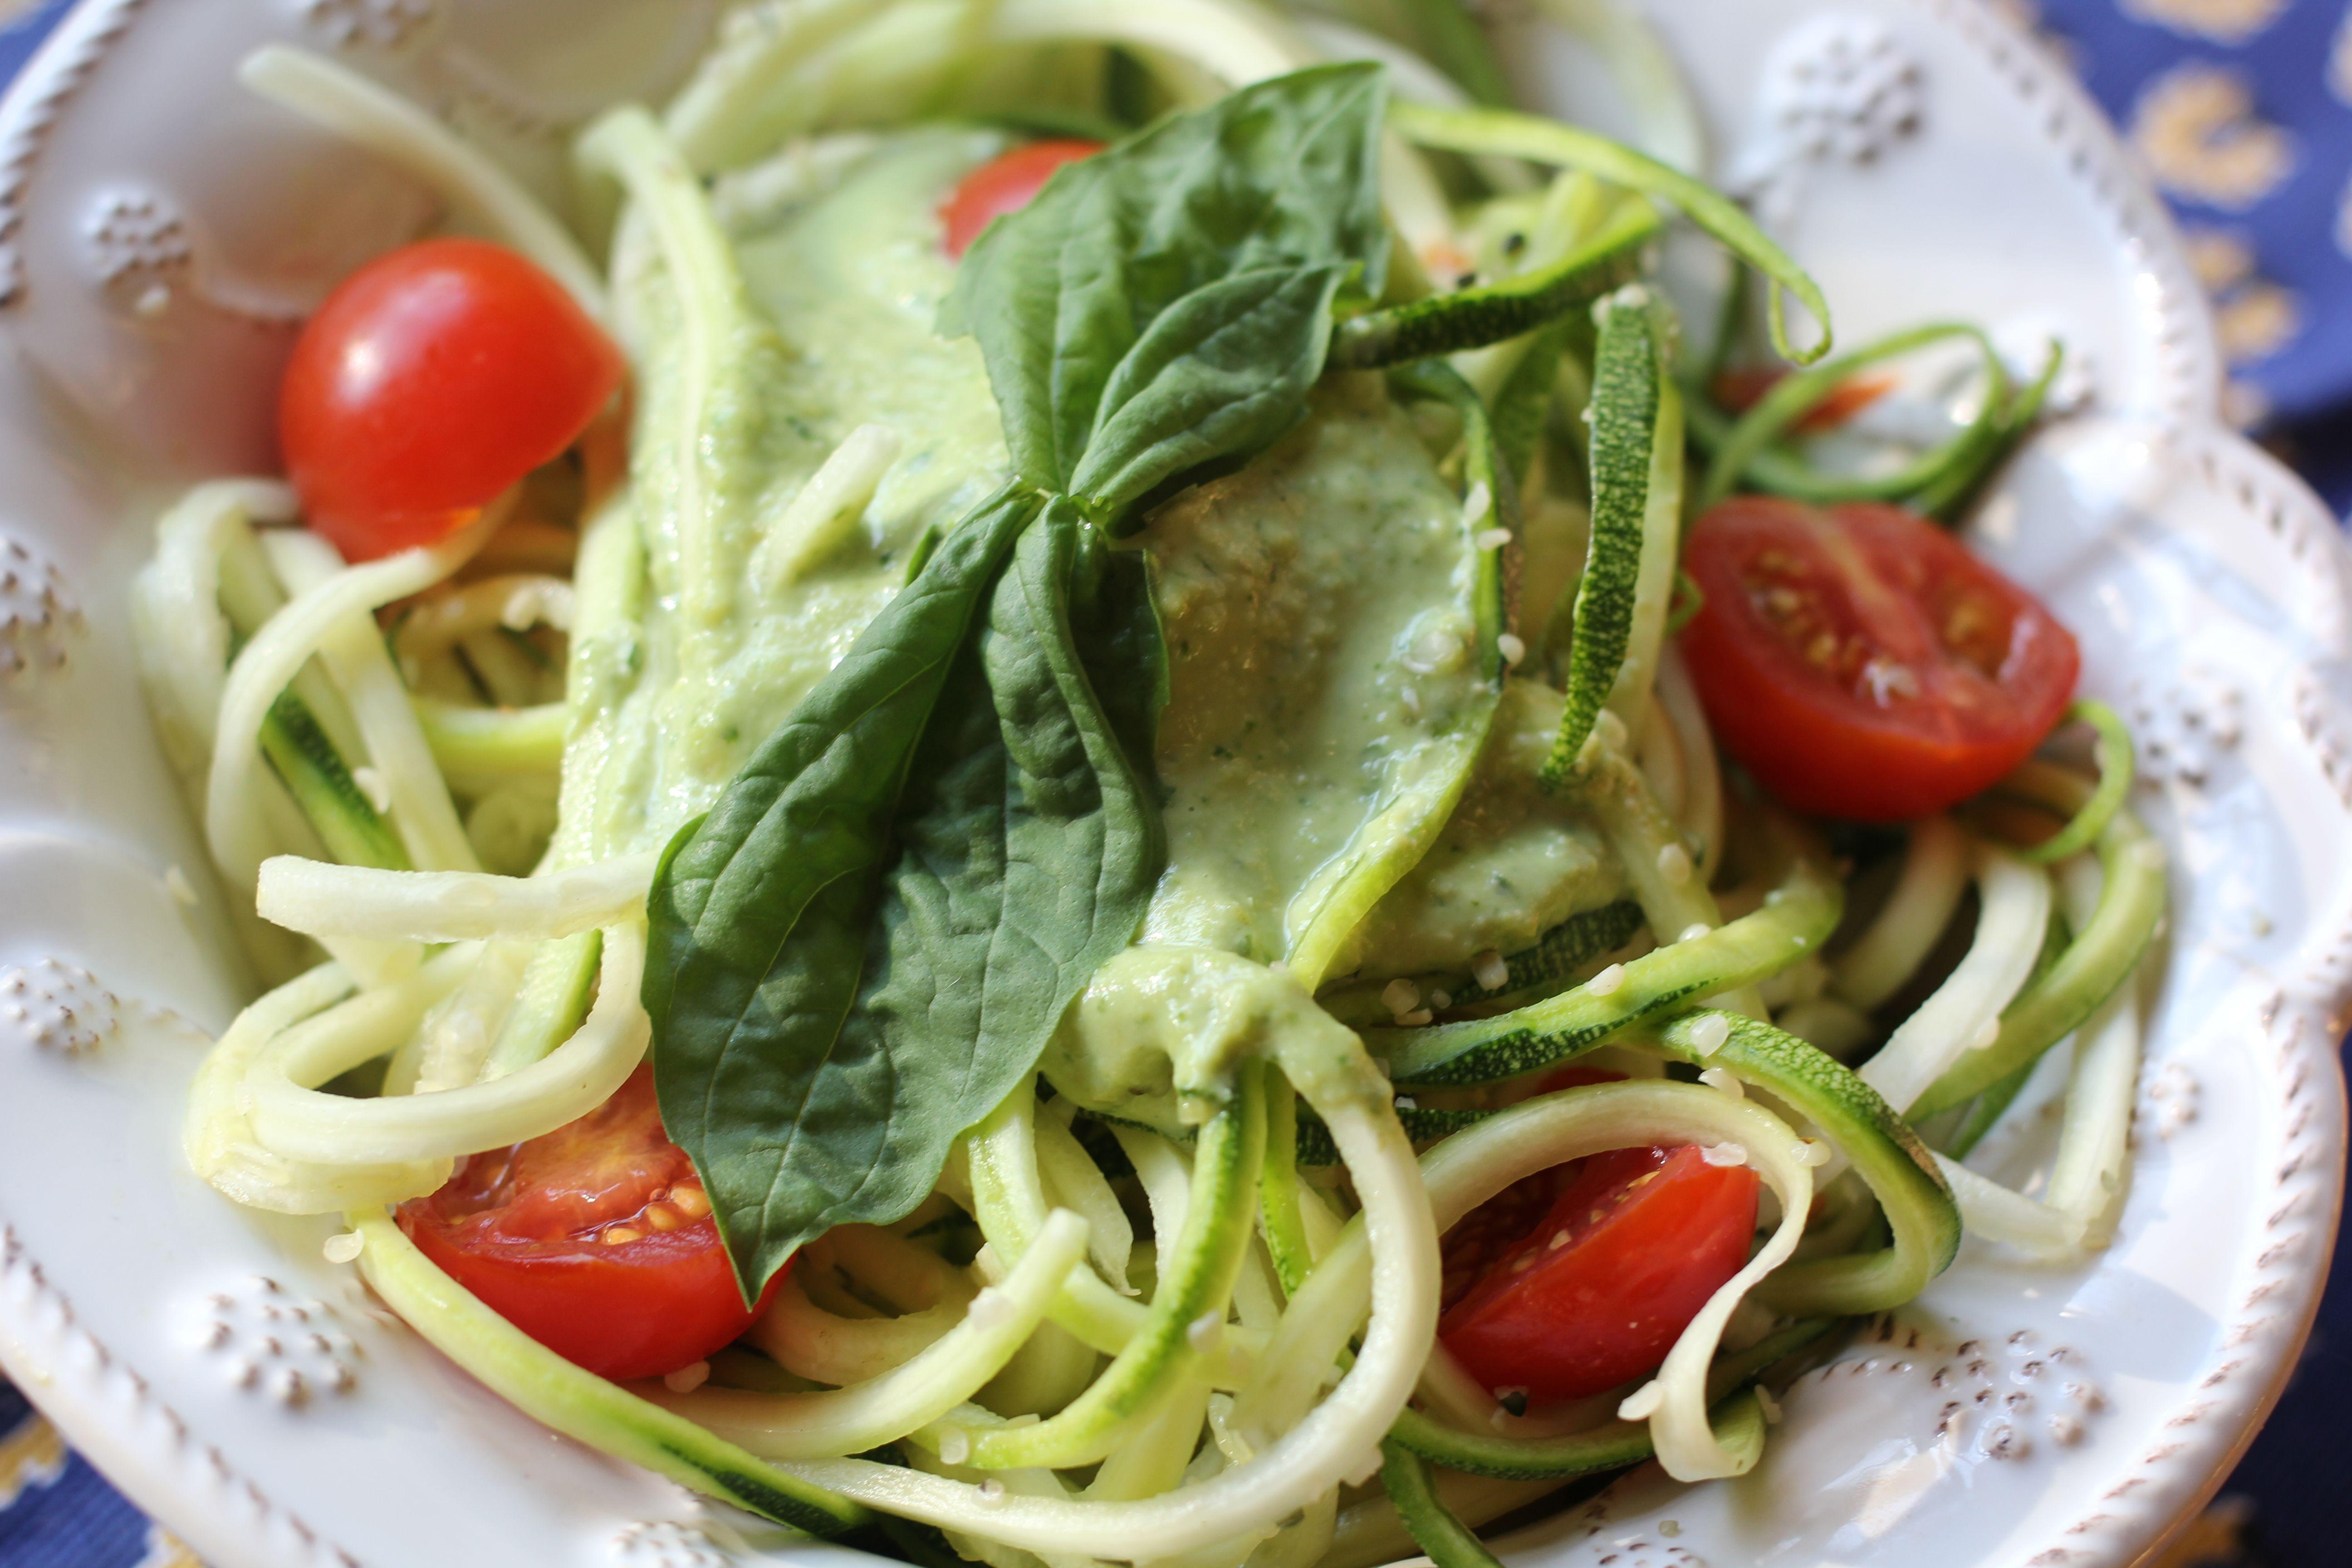 Raw zucchini pasta with fresh basil pesto thesubtlestatement raw zucchini pasta with fresh basil pesto thesubtlestatement vegan forumfinder Image collections